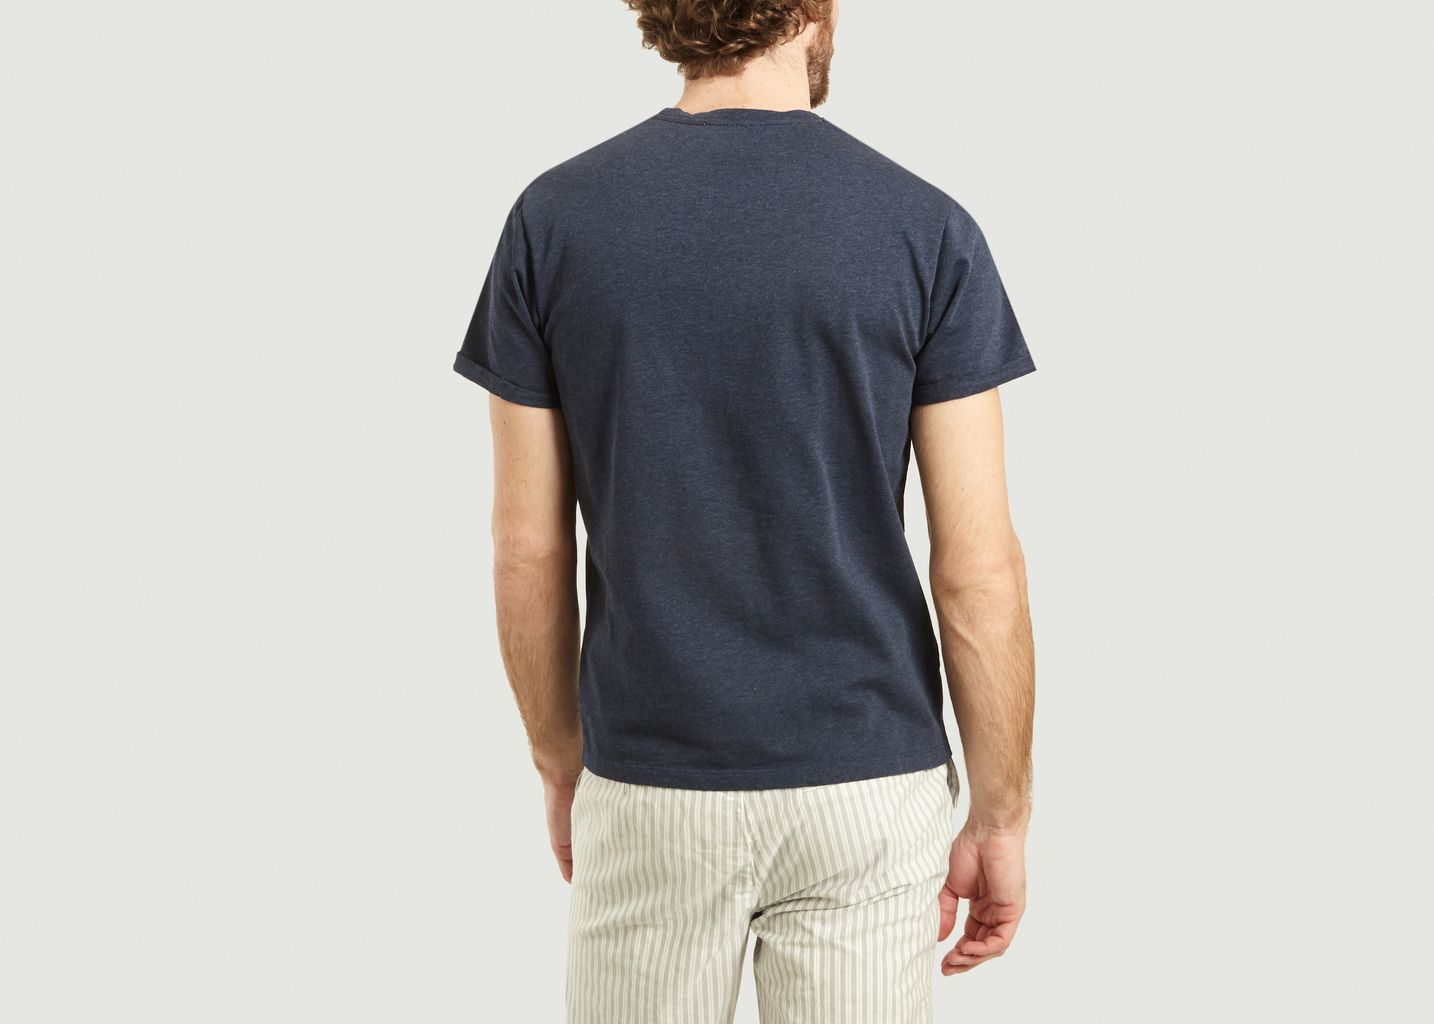 T-Shirt A Poche Siglée Jun - Cuisse de Grenouille